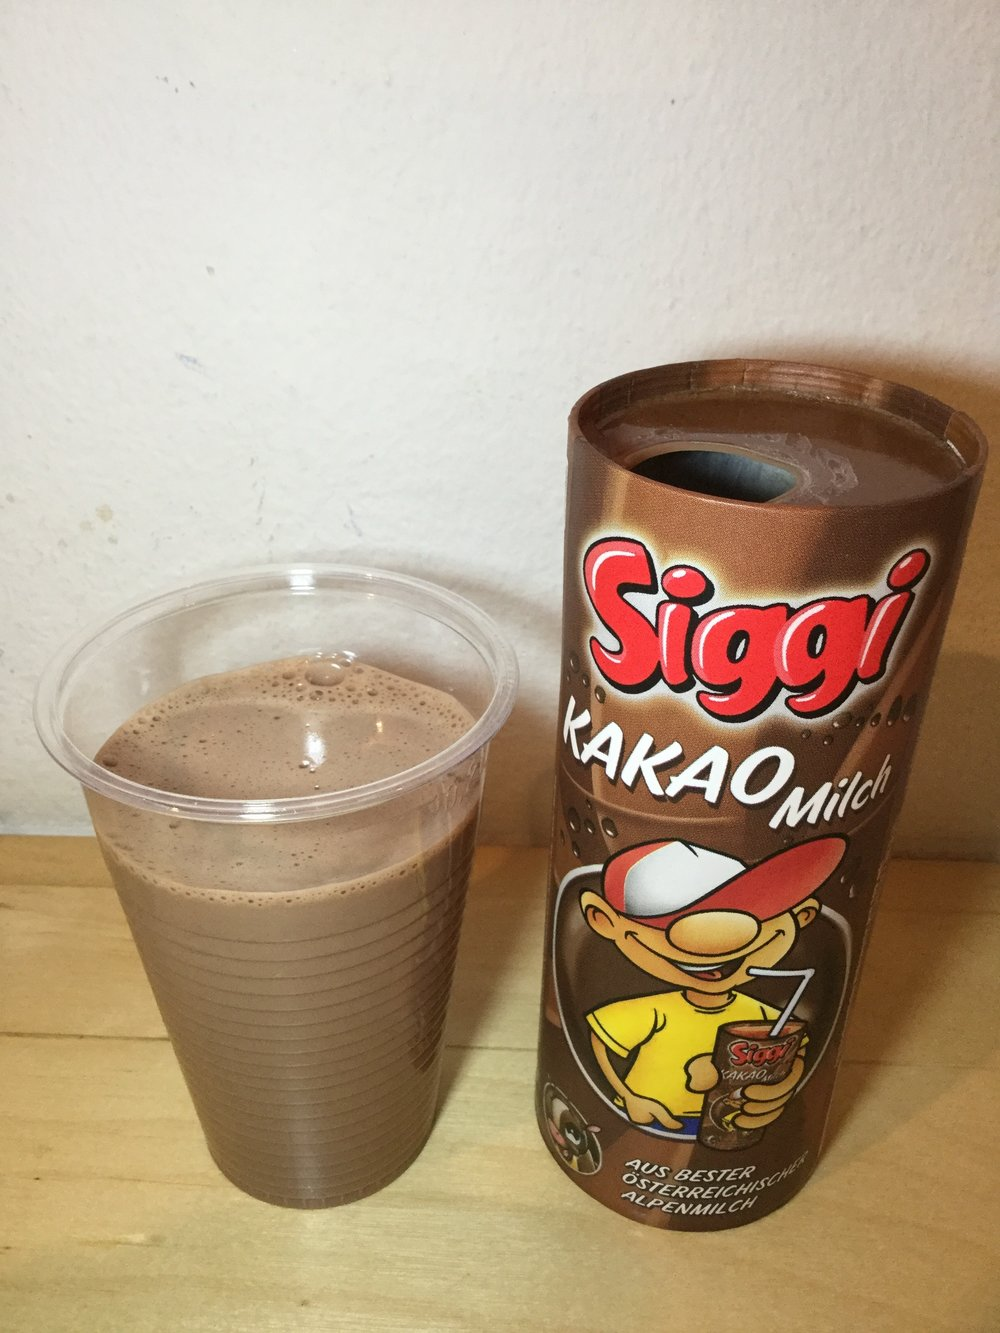 Siggi Kakao Milch Cup